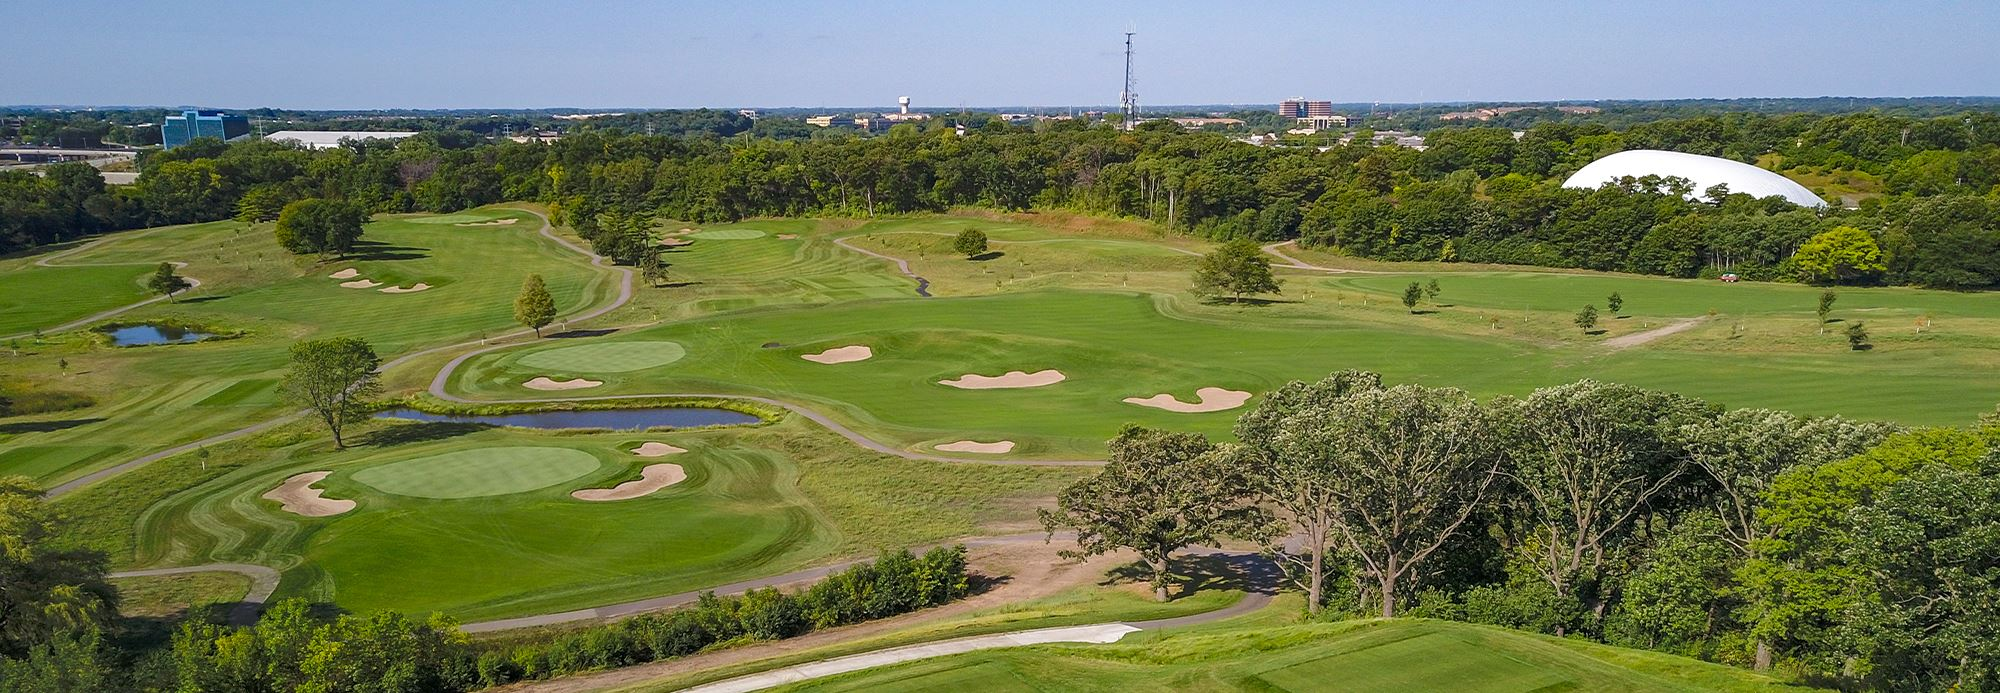 Image of Braemar Golf Course